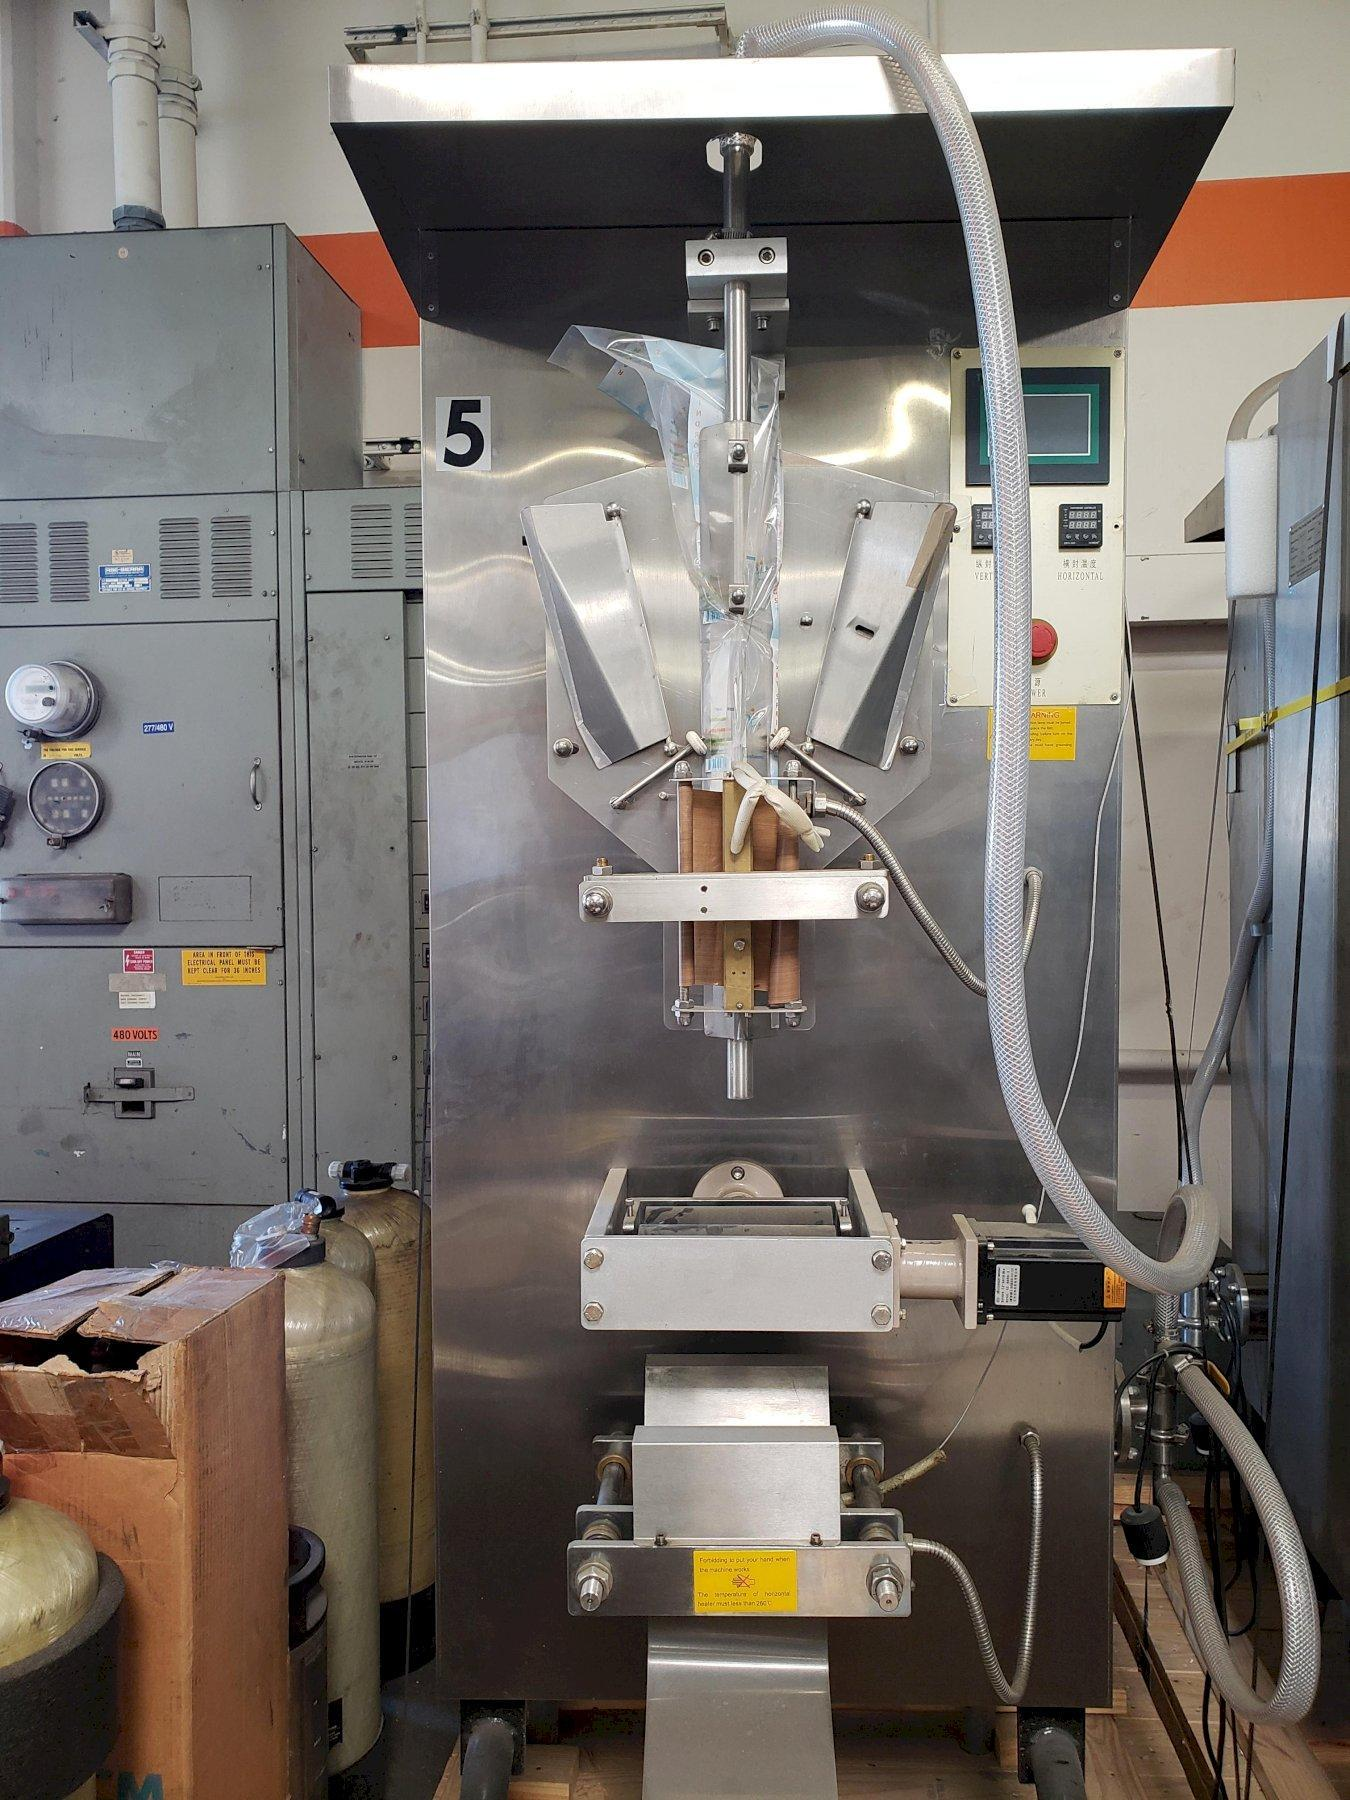 Penglai Machines Liquid Pouch Filling Machine Model# YX-LP1000 2017